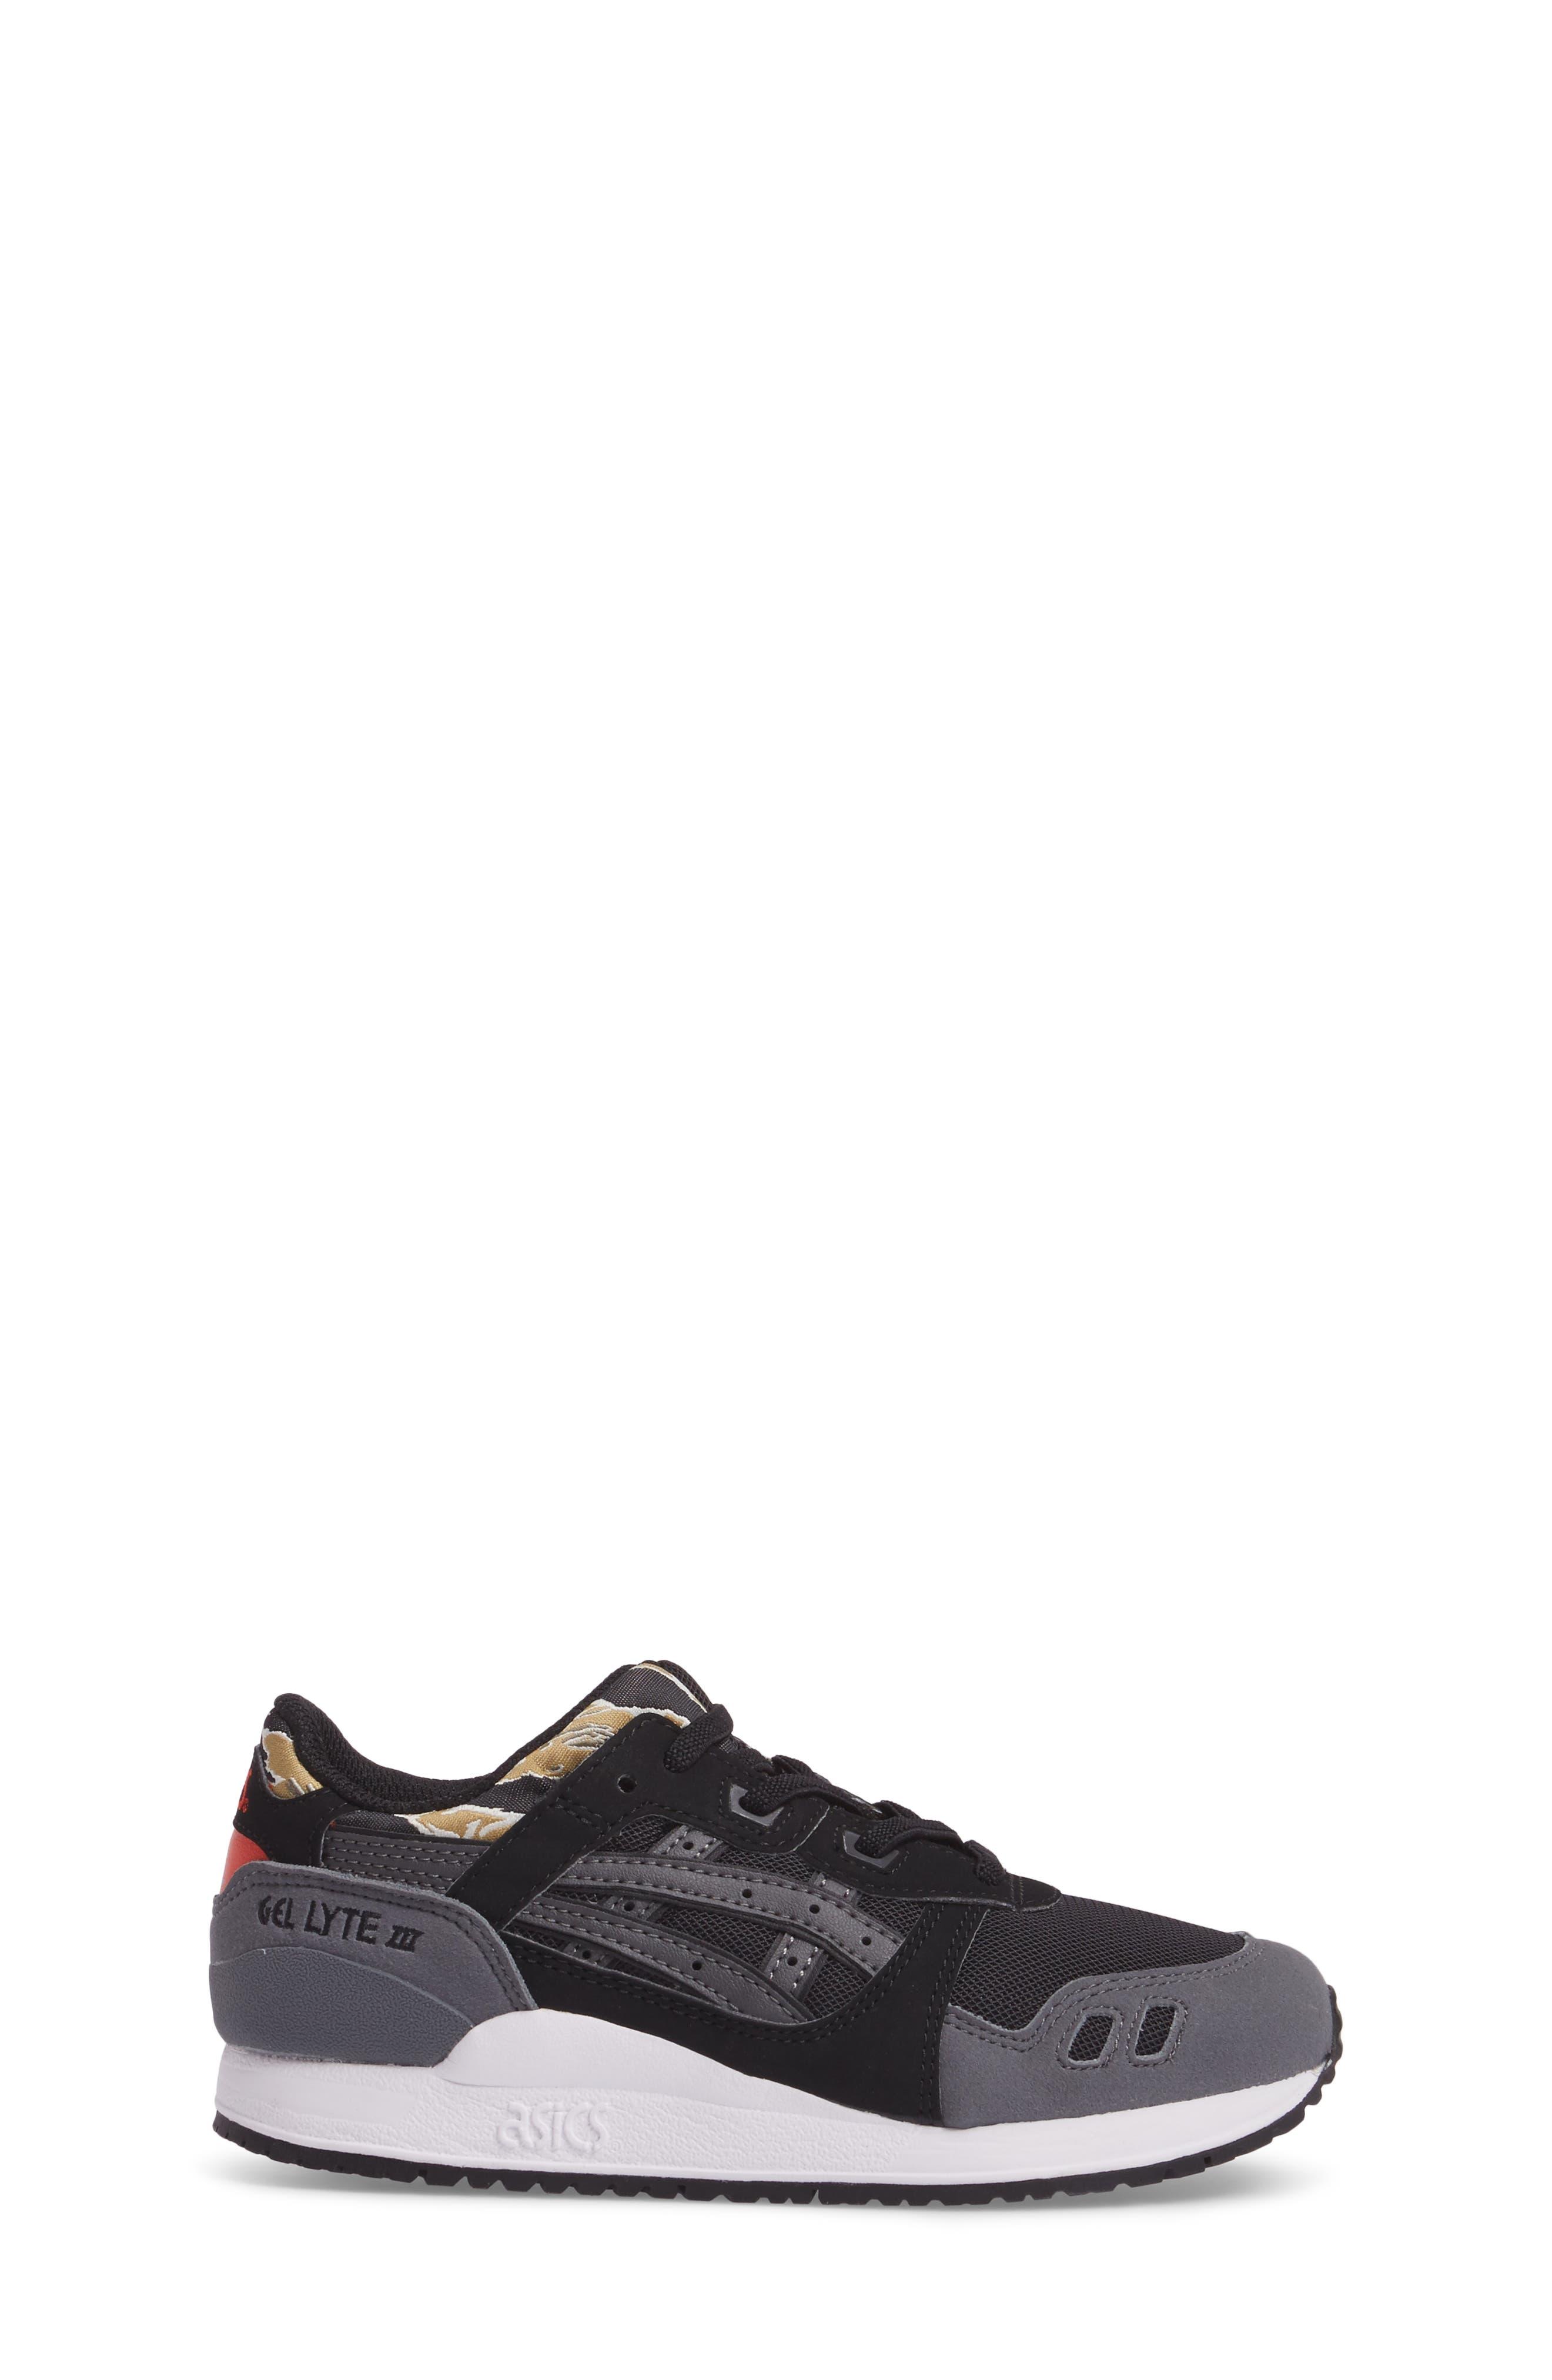 GEL-LYTE<sup>®</sup> III PS Slip-On Sneaker,                             Alternate thumbnail 3, color,                             001